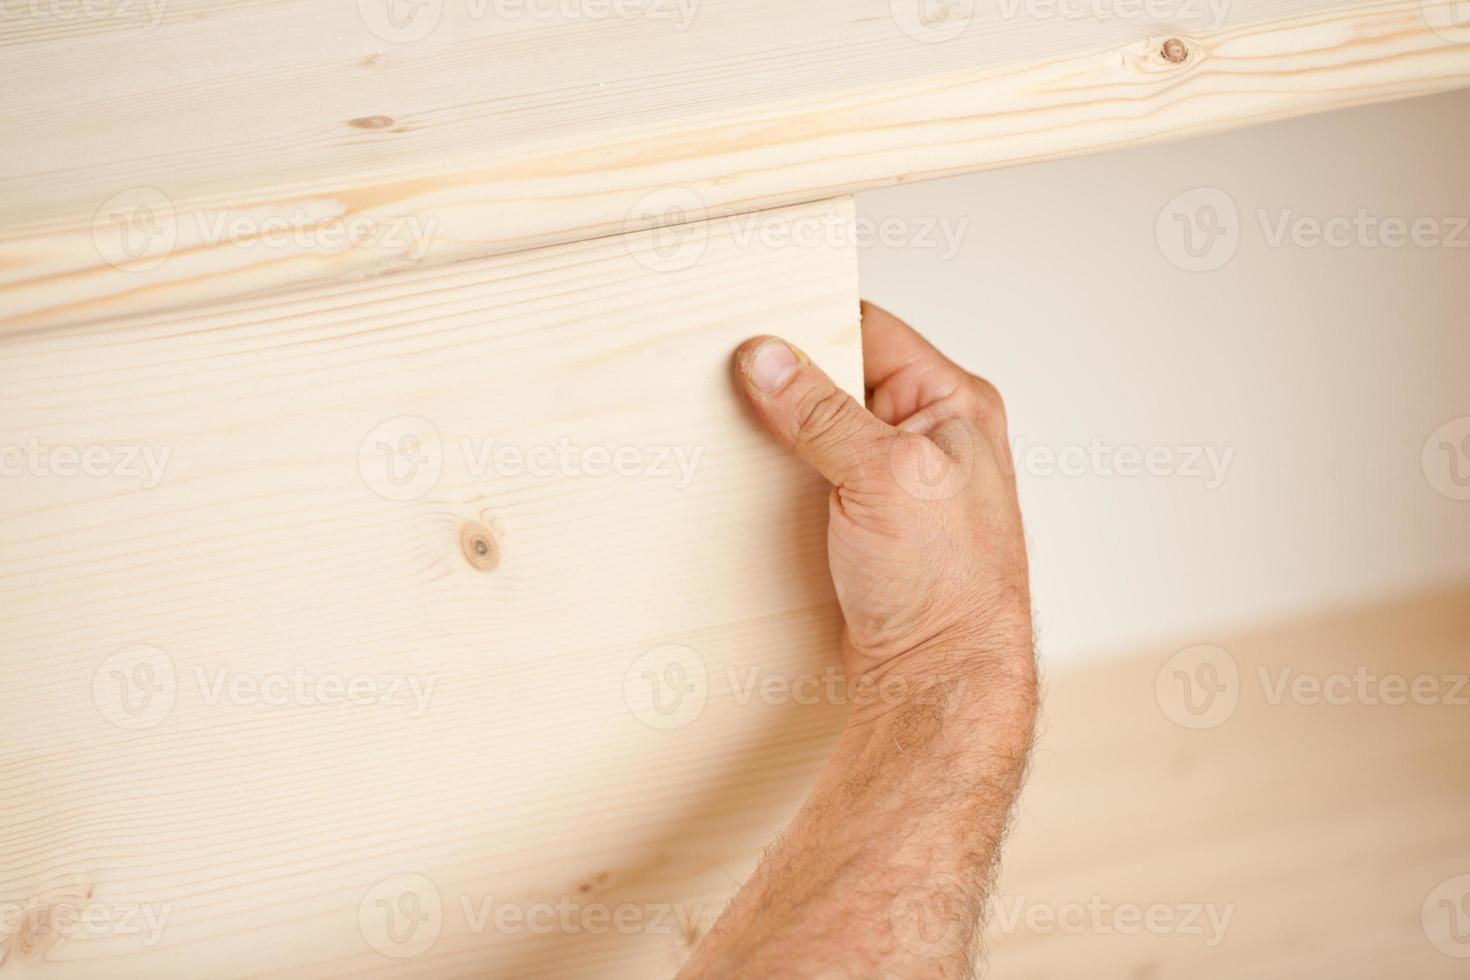 Hand Holzbrett in Position setzen foto